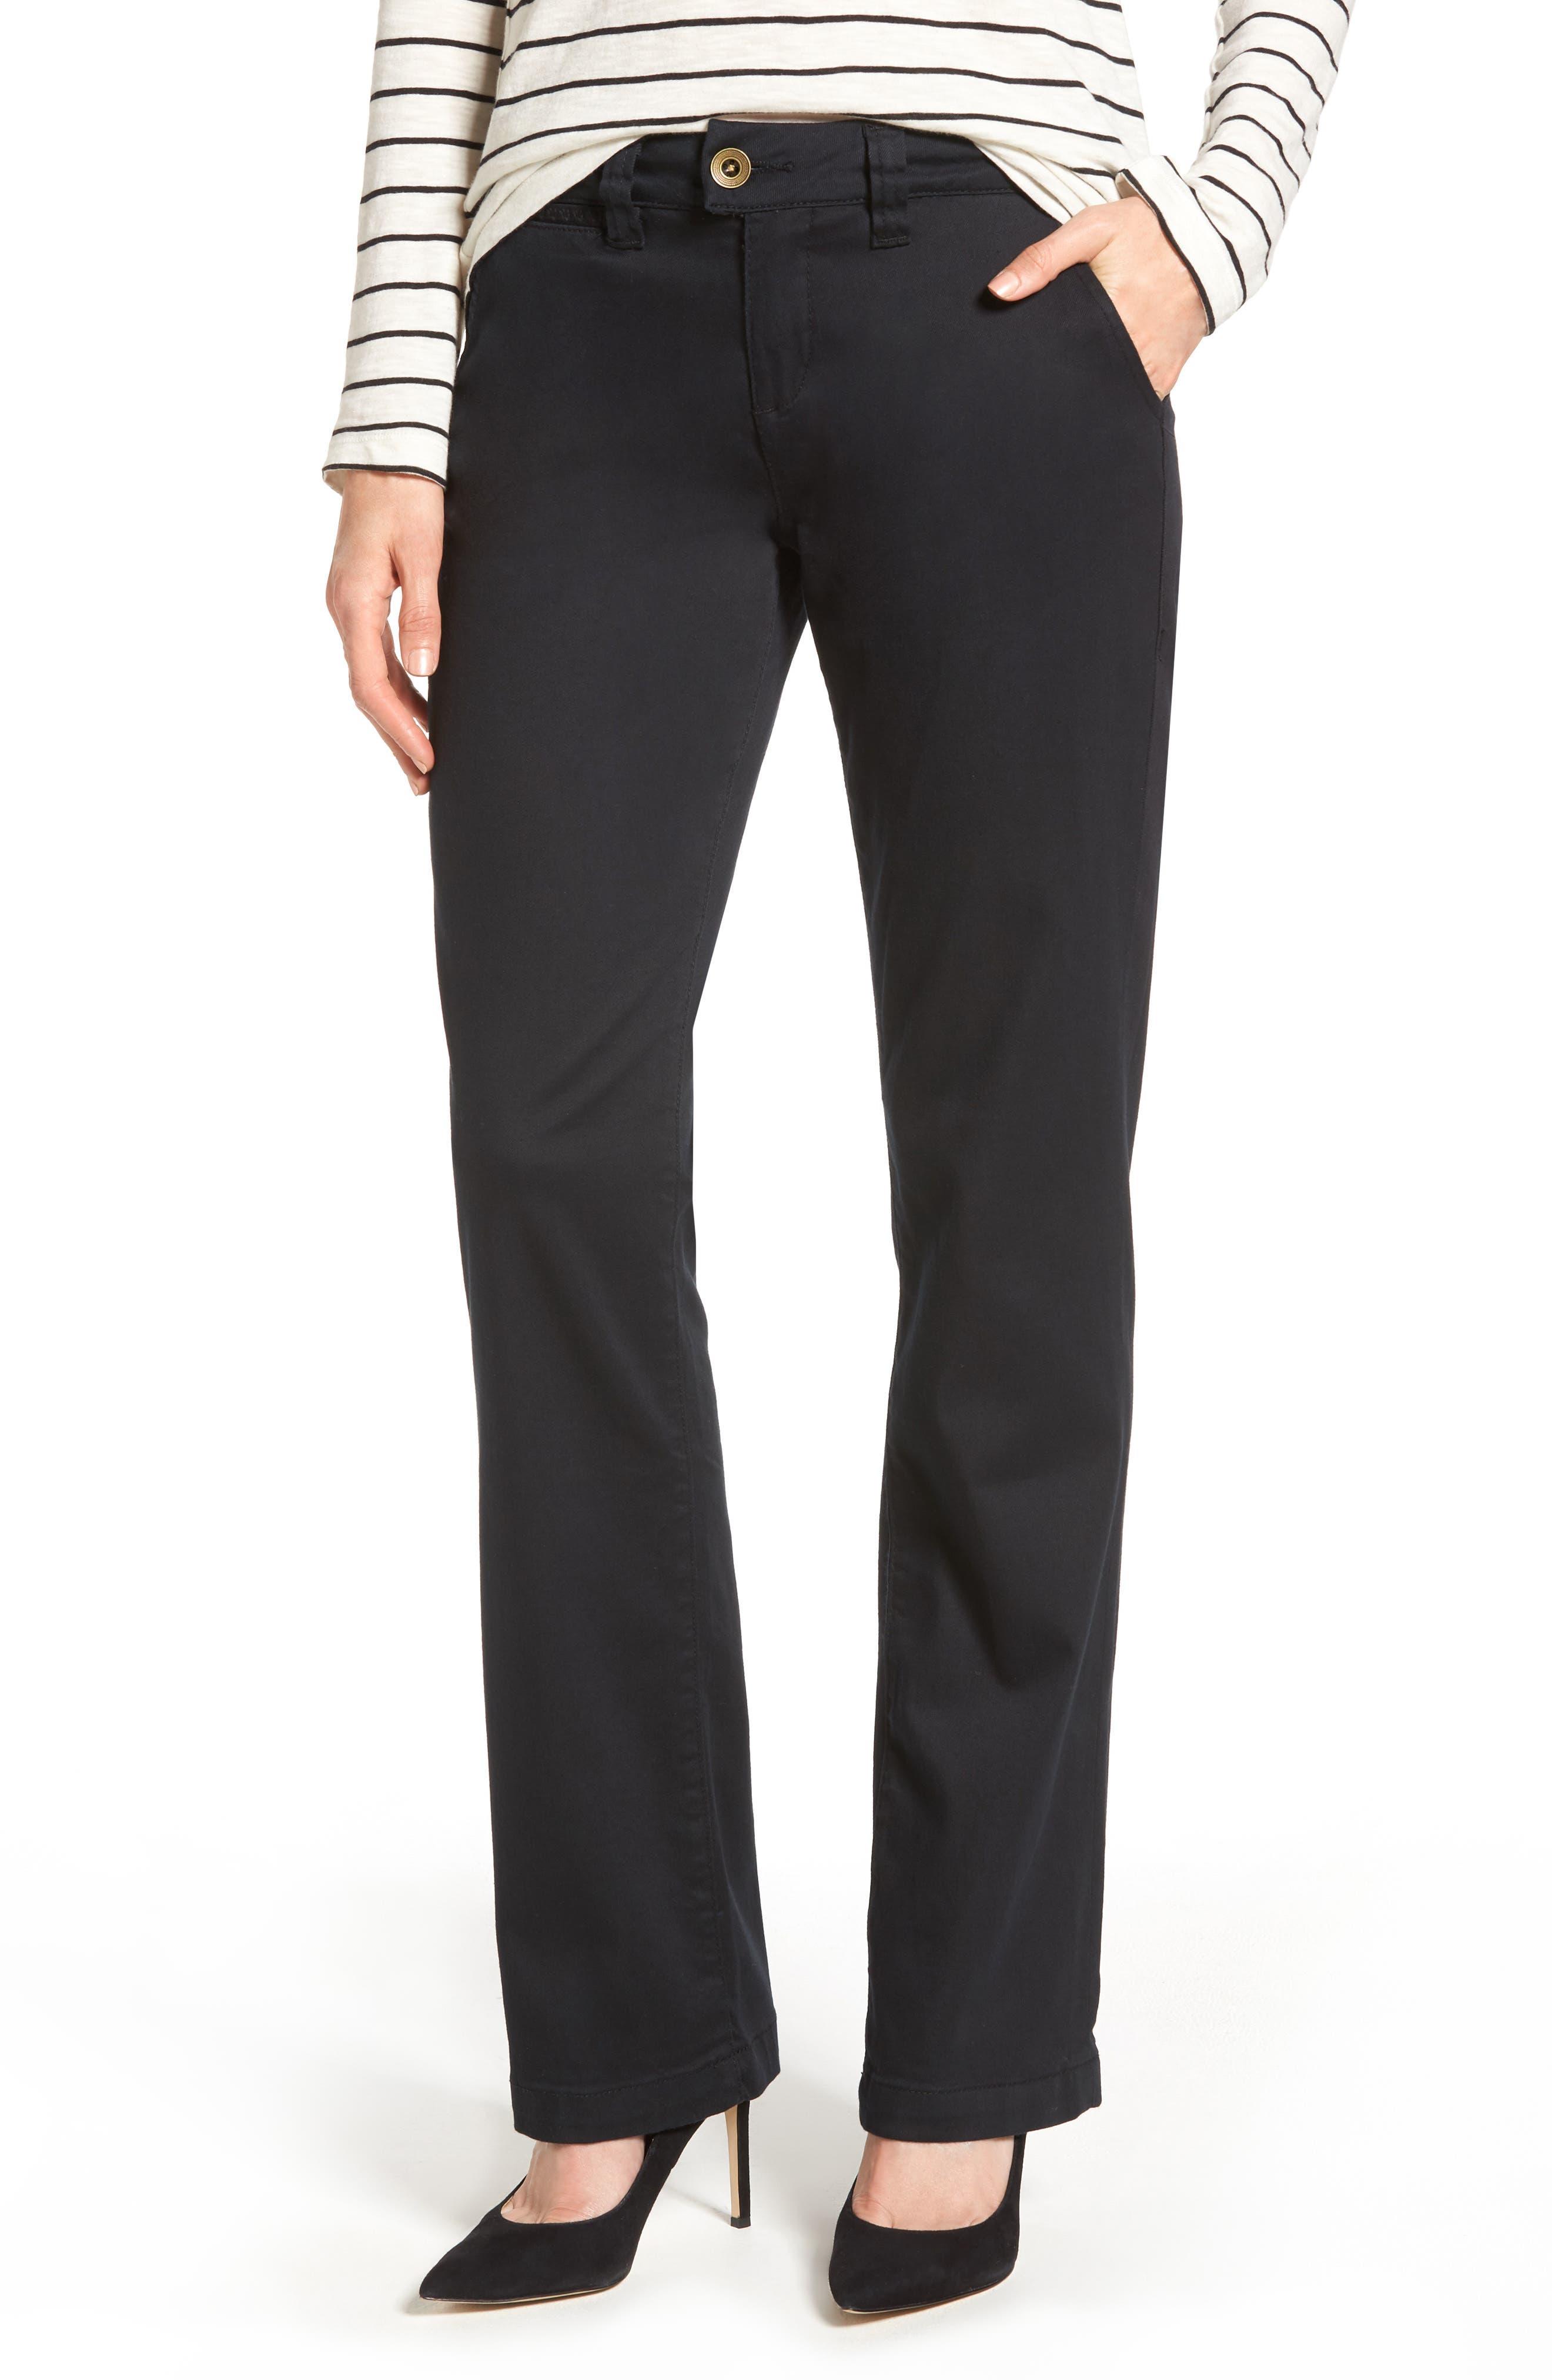 Jag Jeans Standard Stretch Twill Trousers